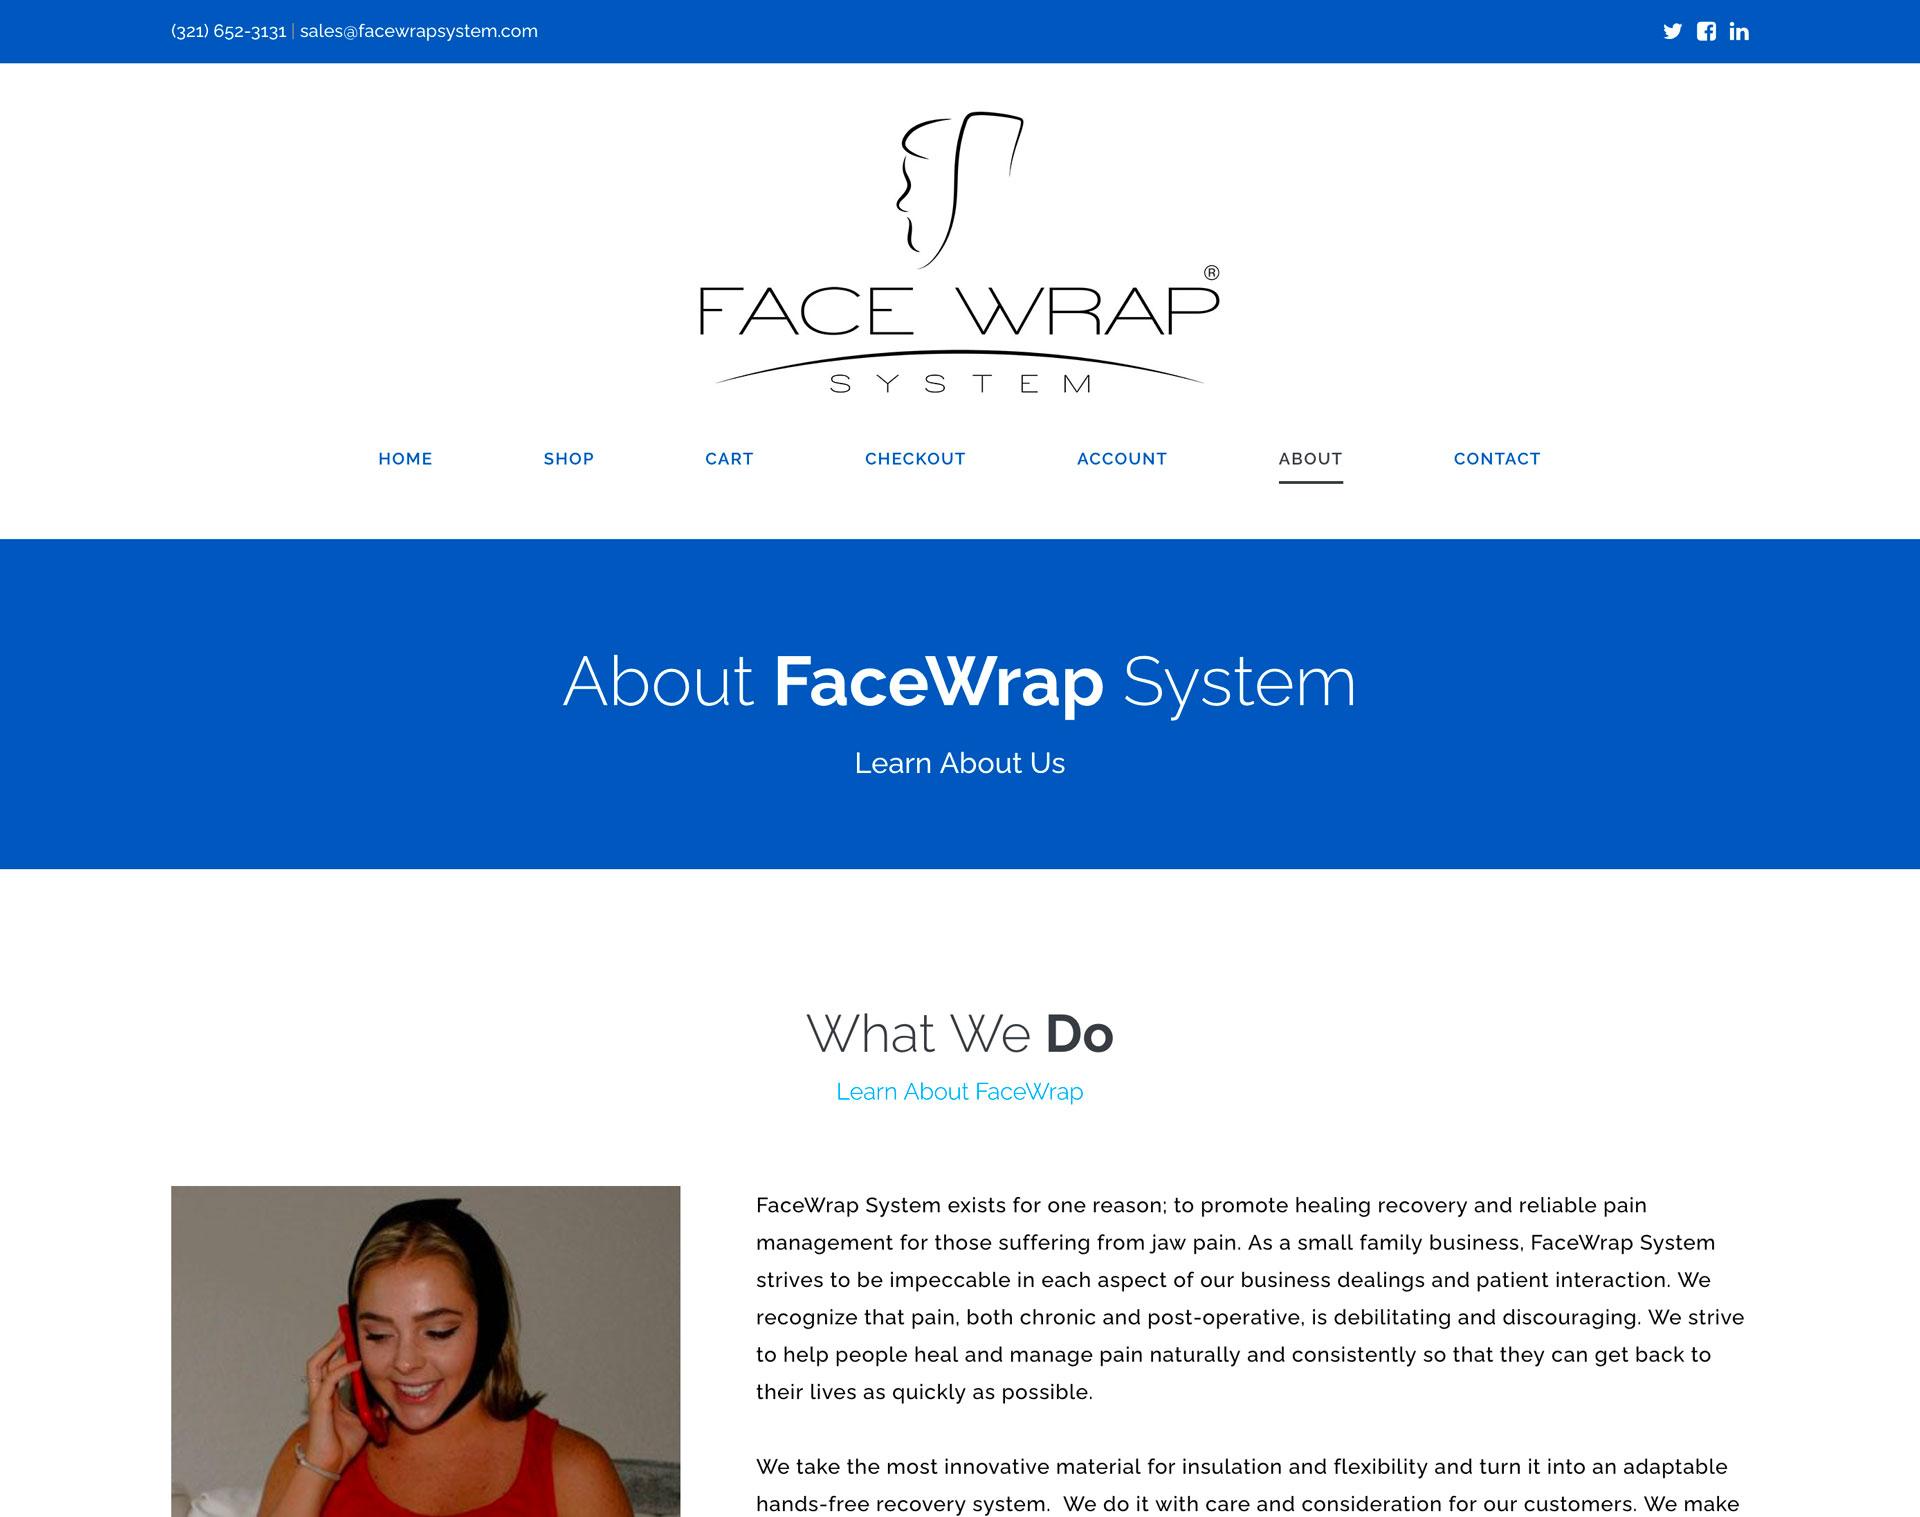 New Web Design: Face Wrap System